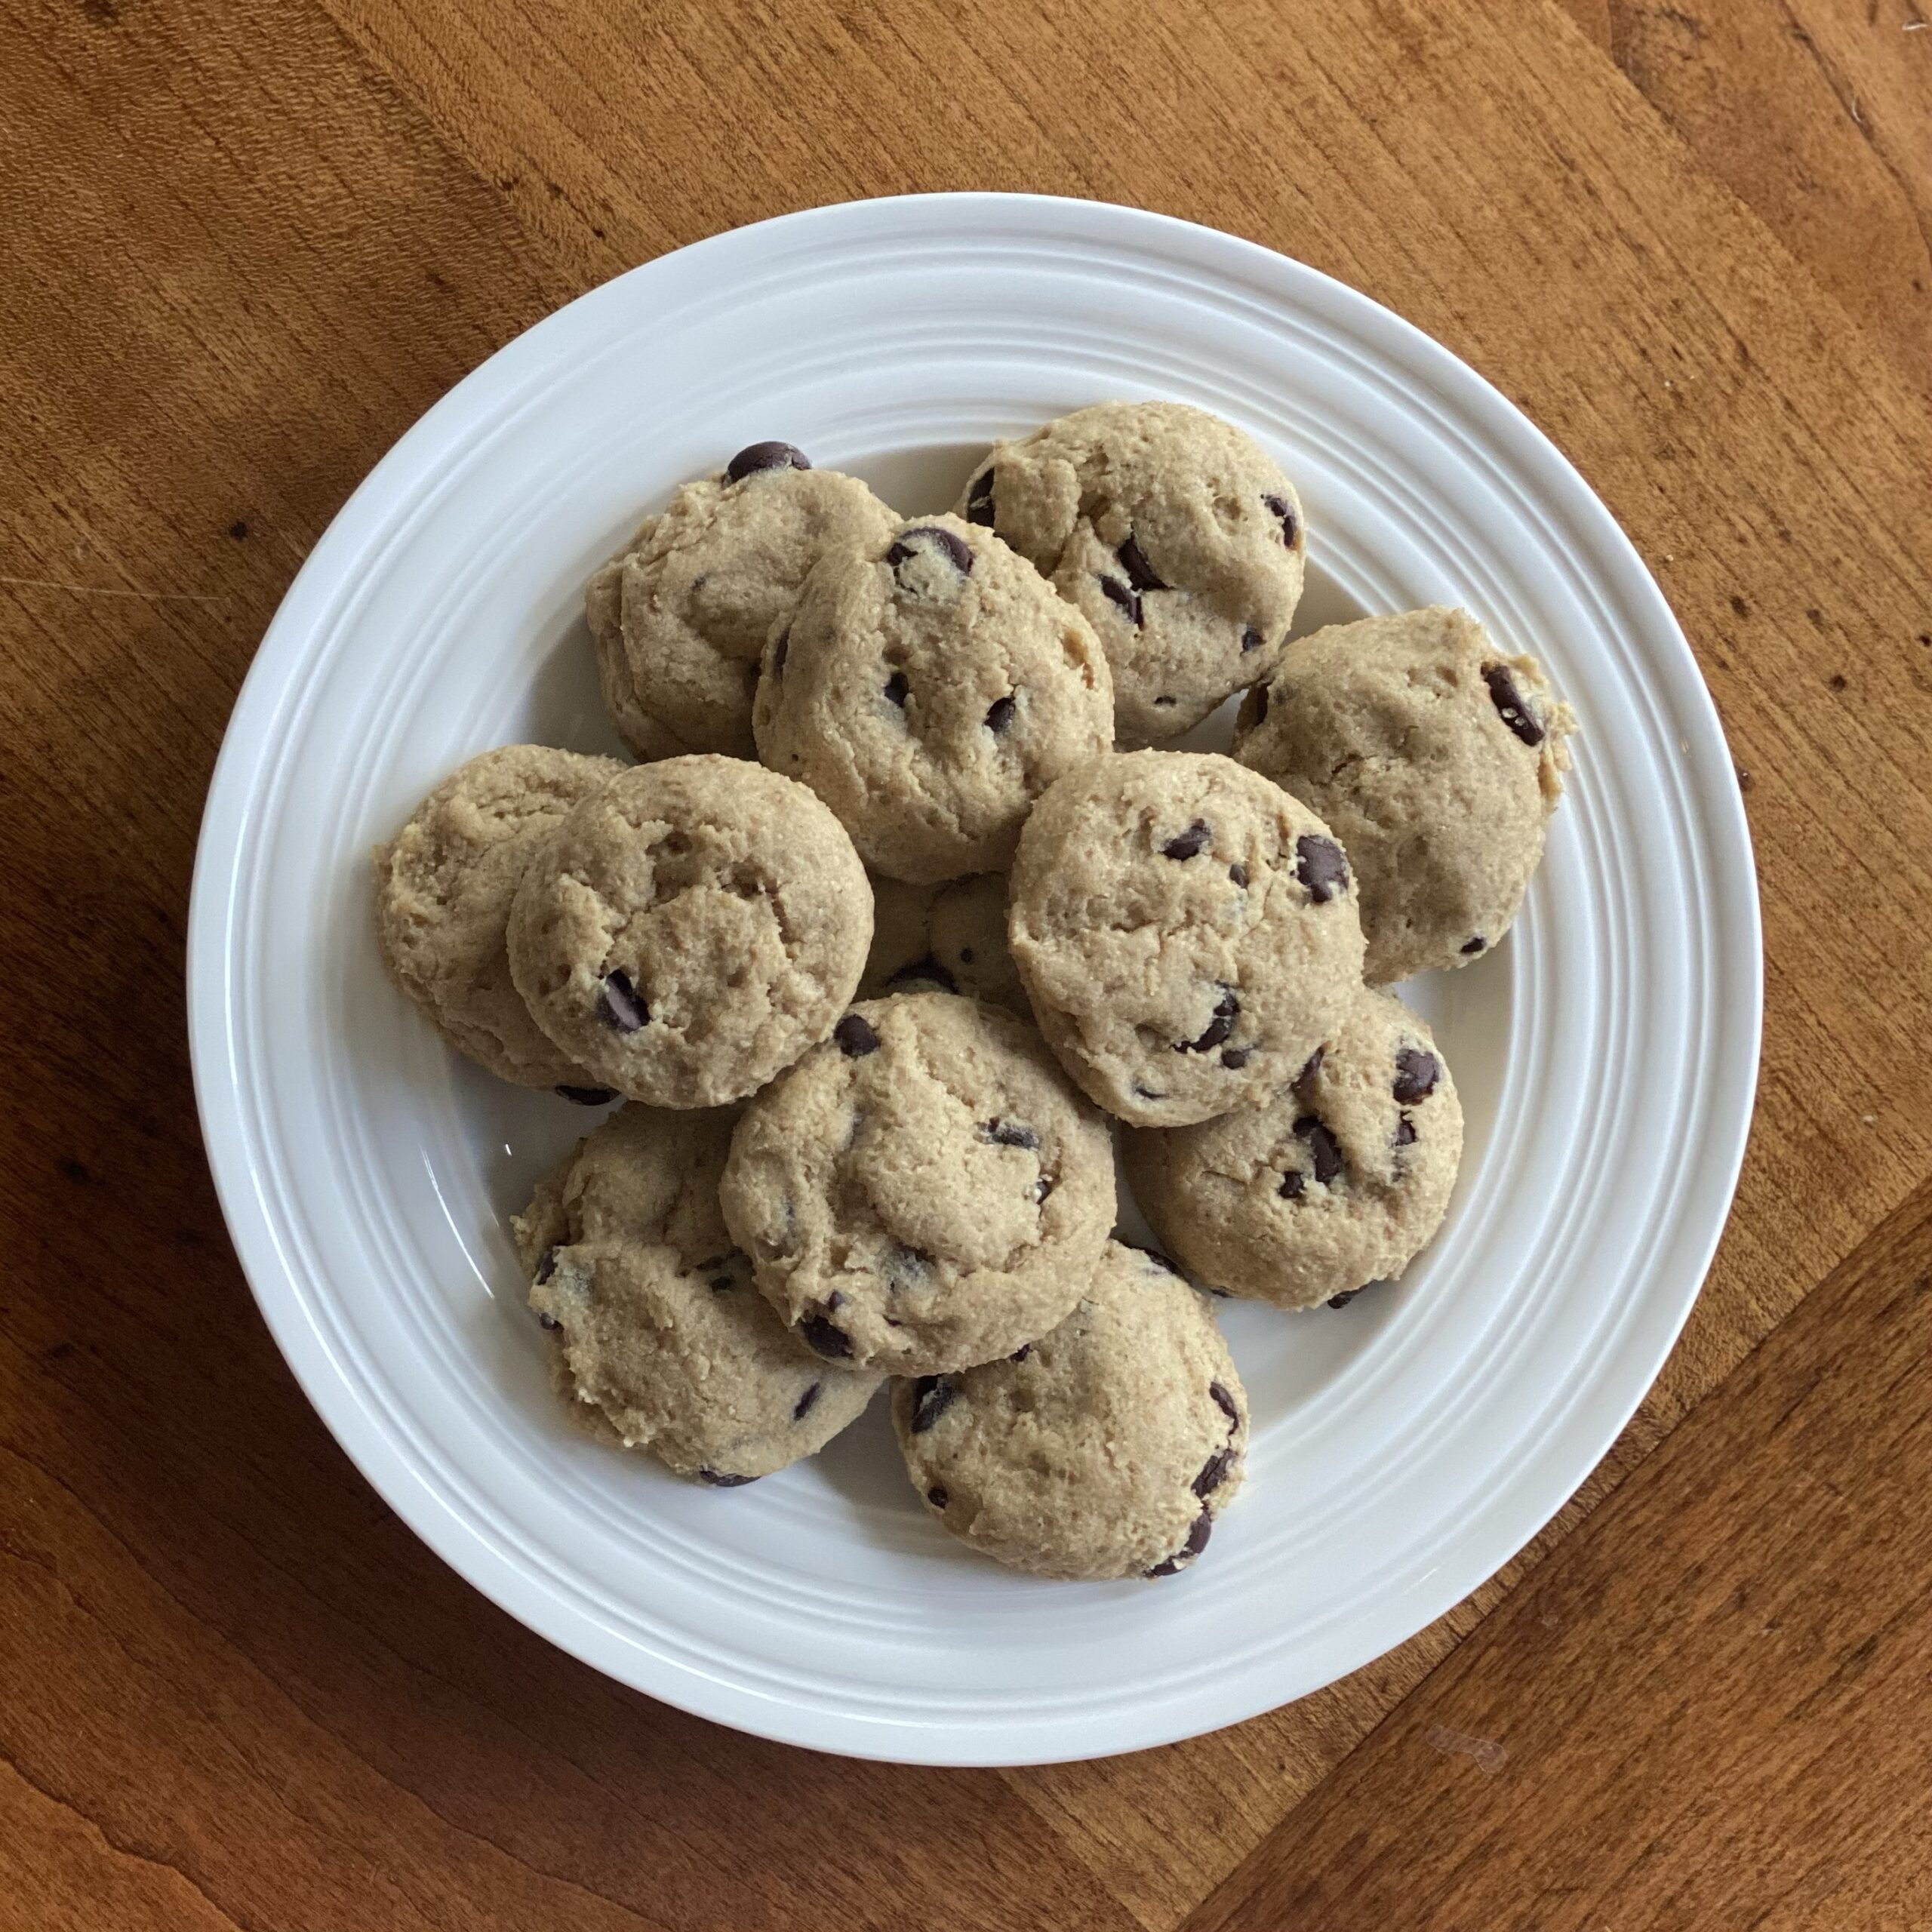 Tahini Chocolate Chip Cookies (keto, paleo, no coconut flour, vegan option)